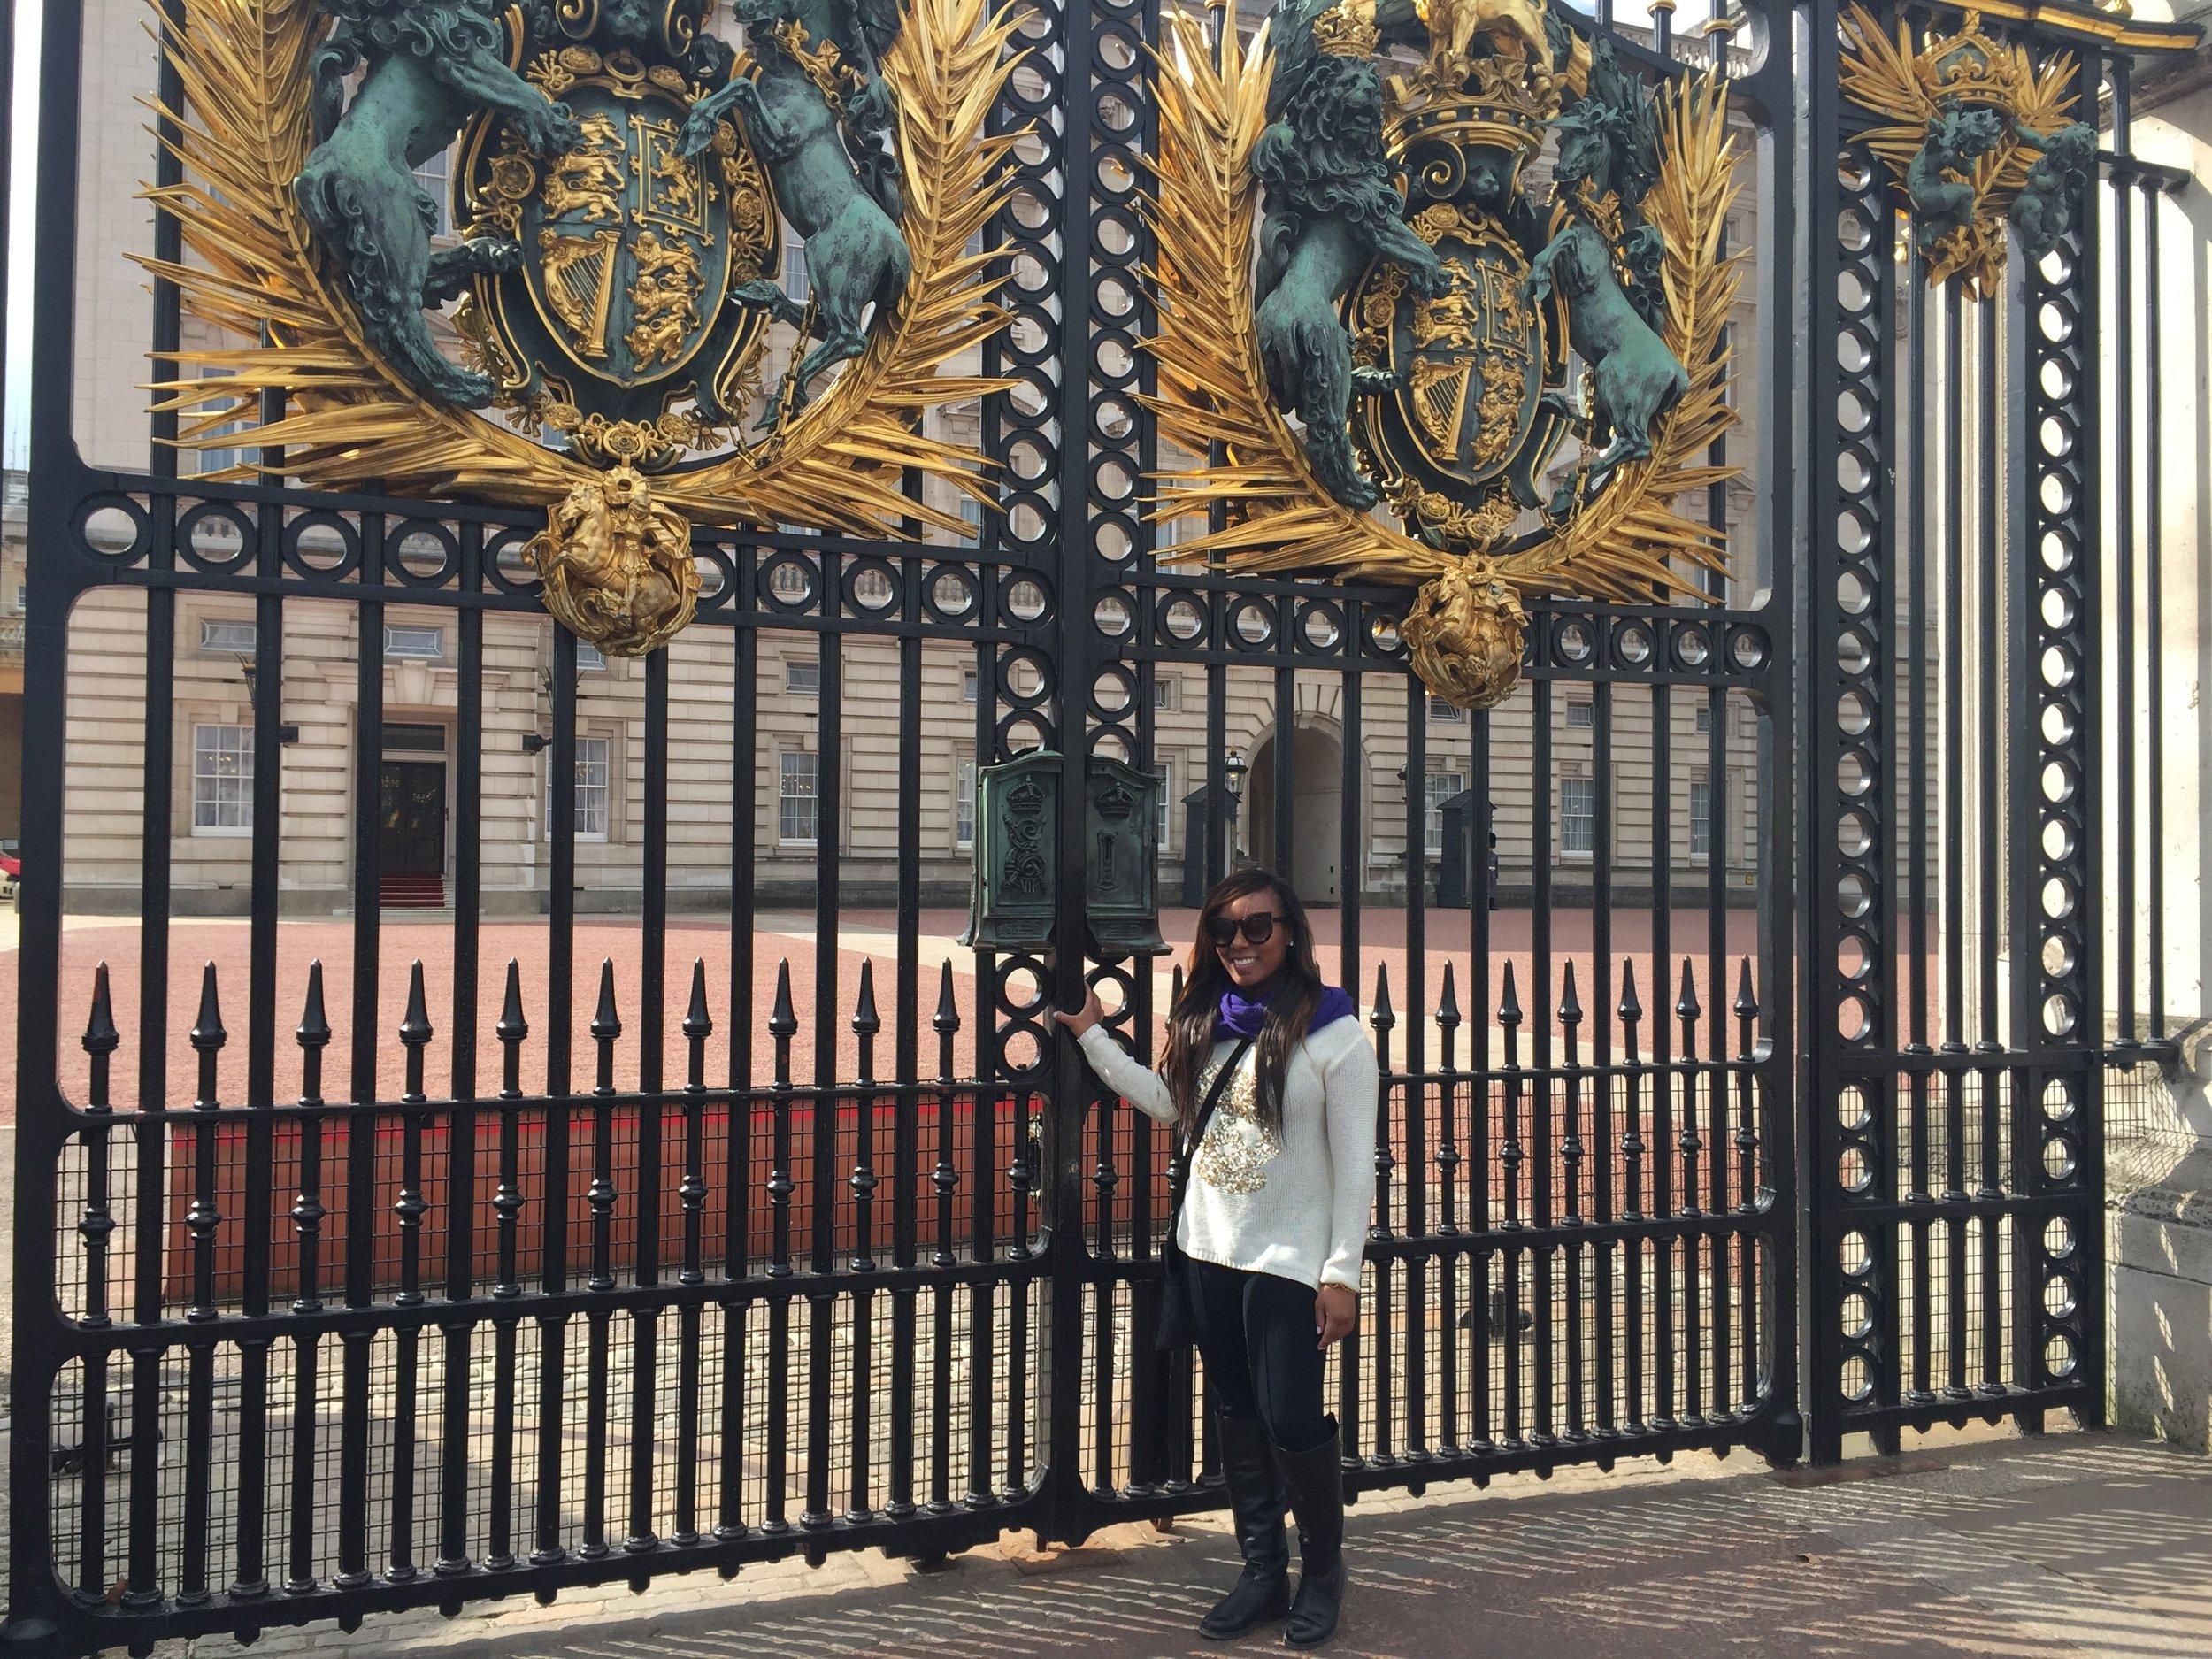 bunkingham palace pic.jpg